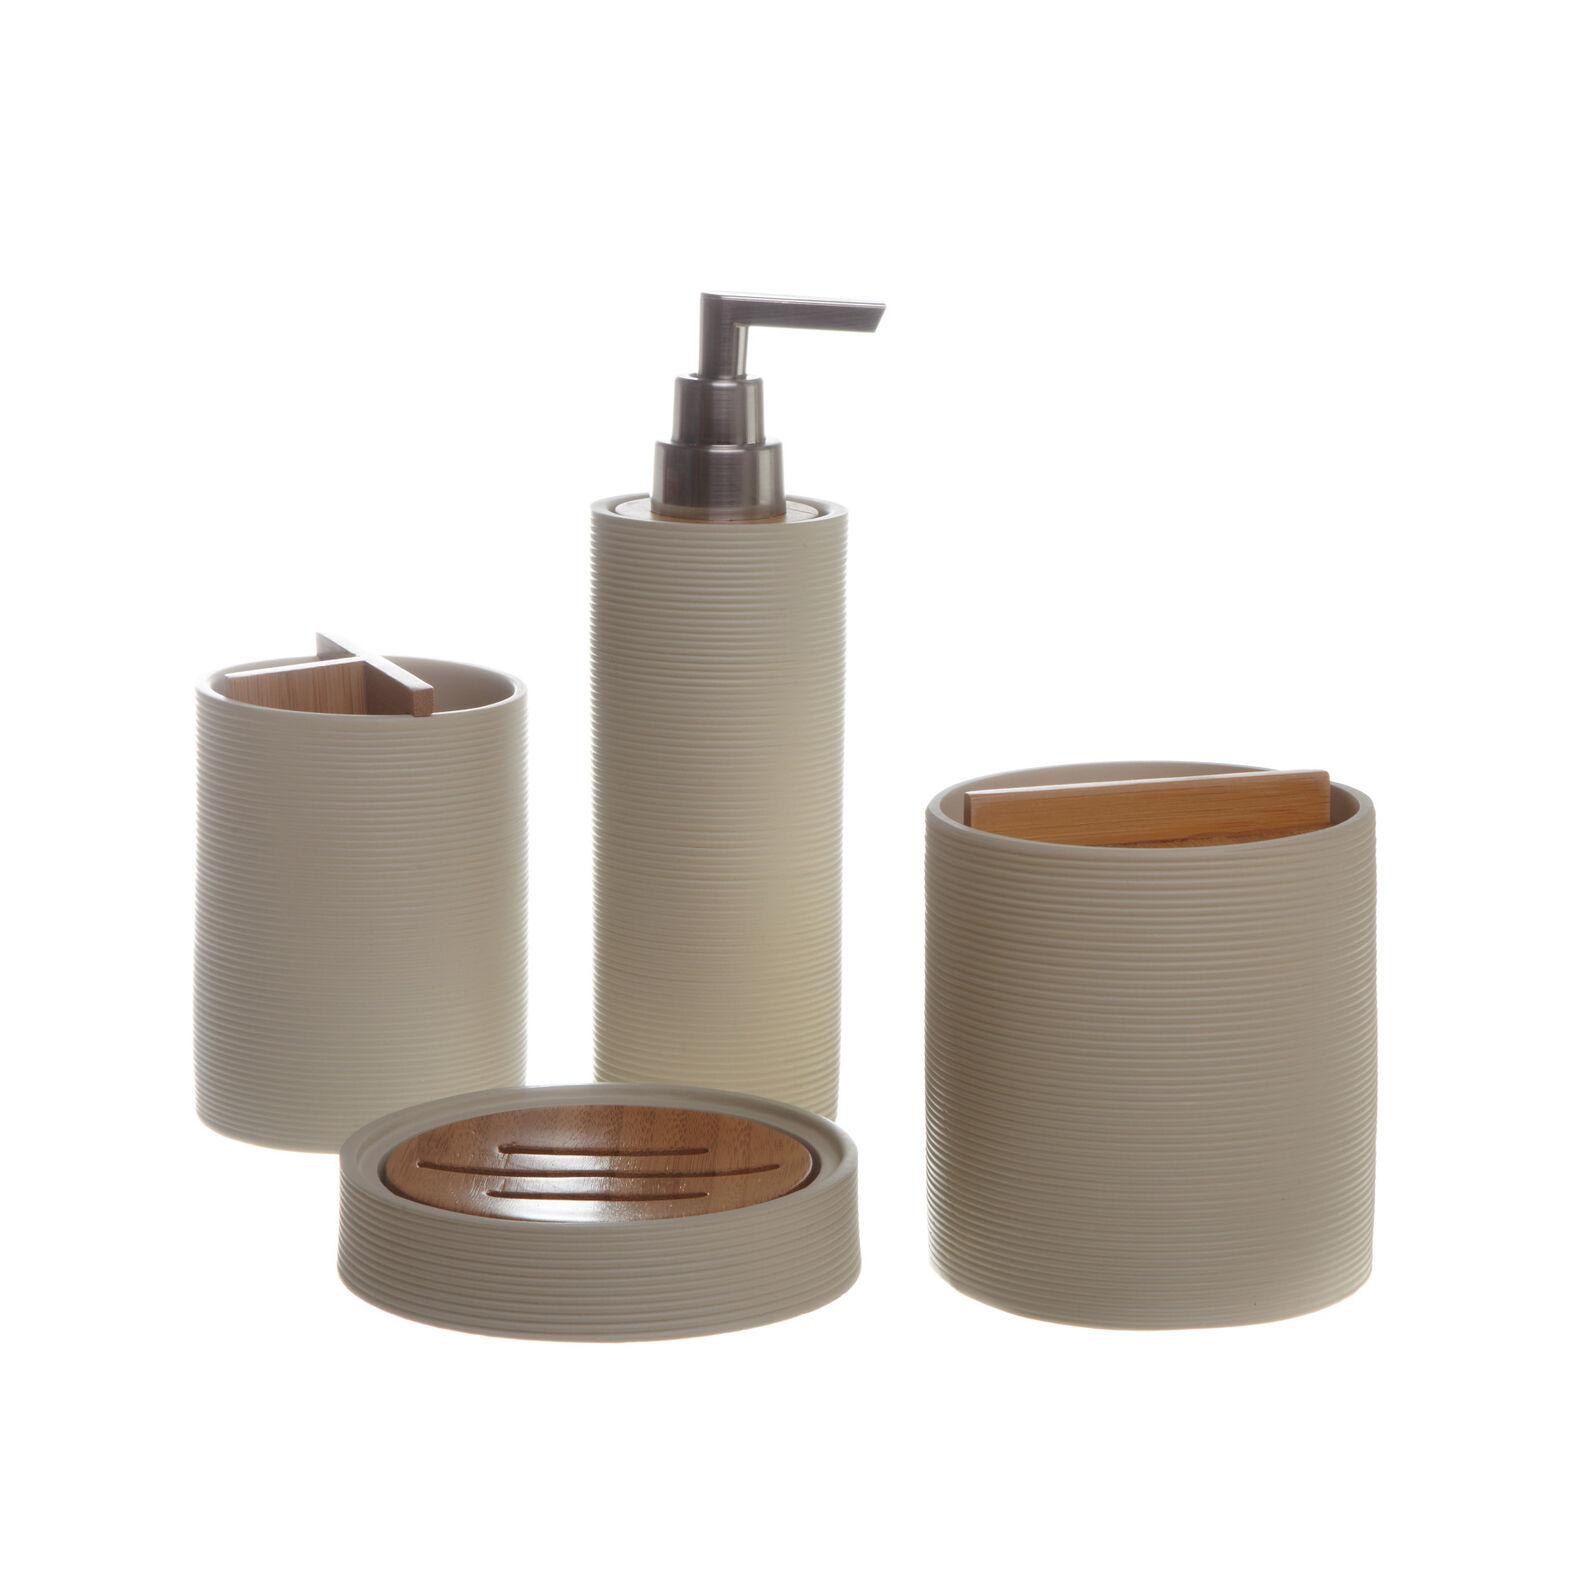 Set bagno poliresina legno coincasa - Set asciugamani bagno ikea ...